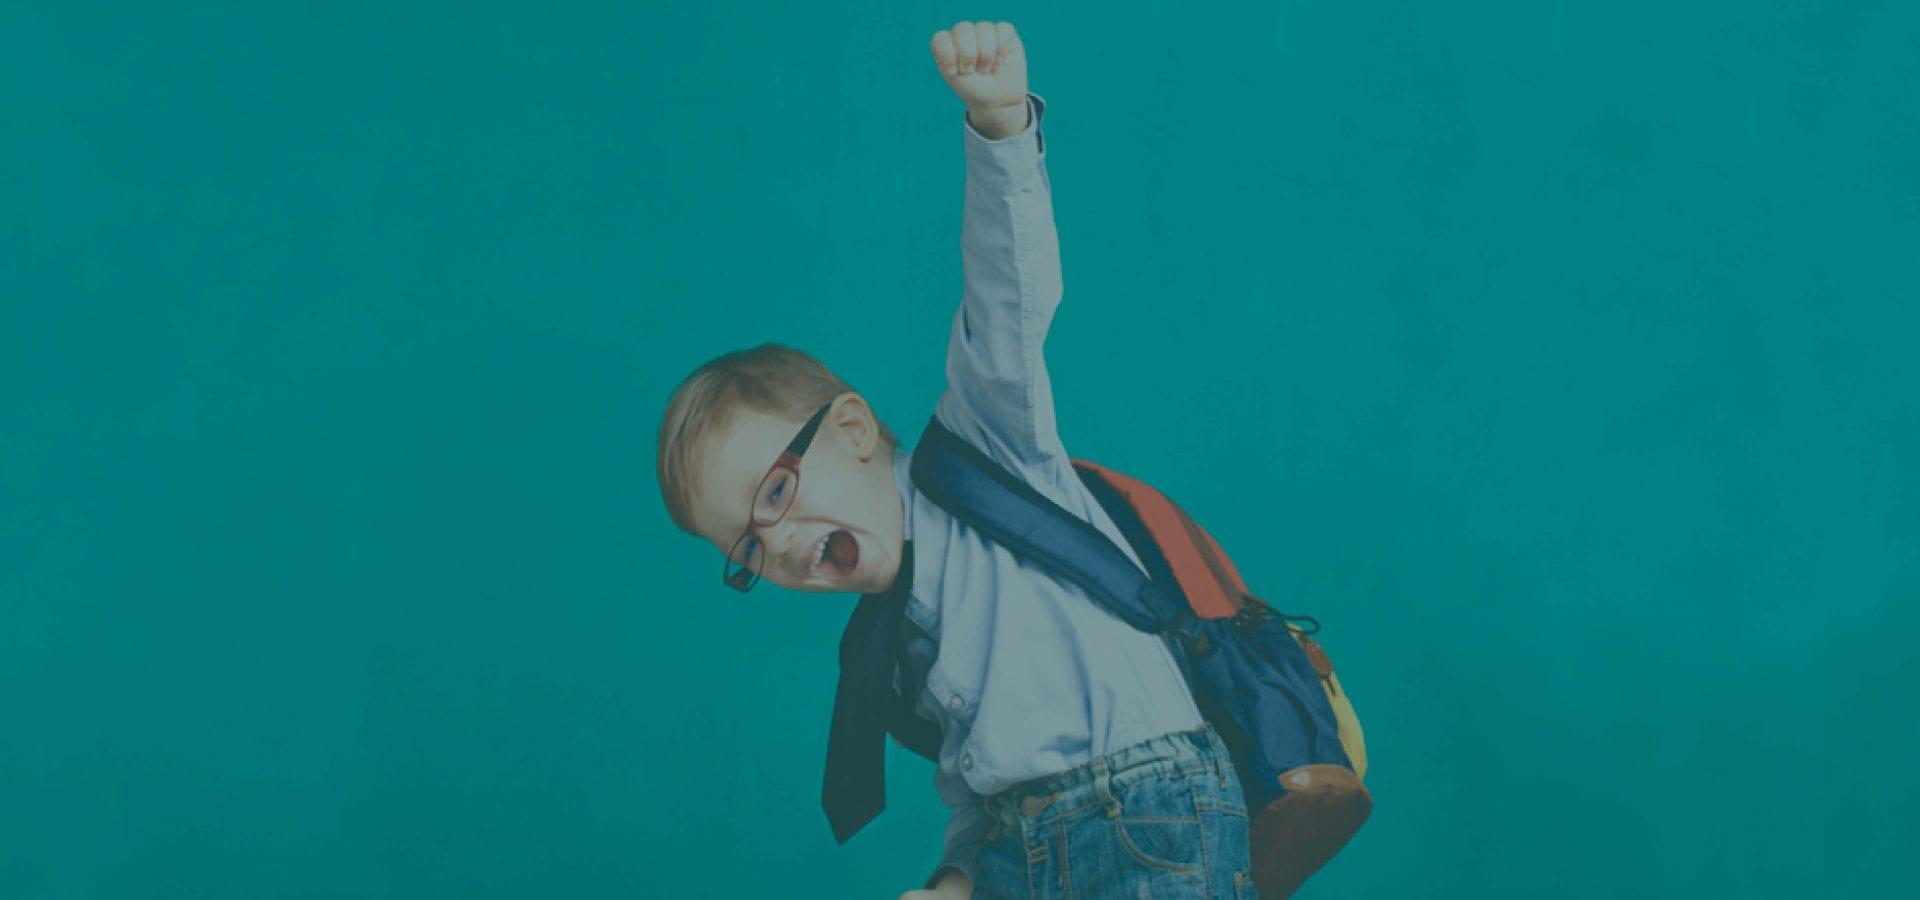 YMCA school kid with backpack